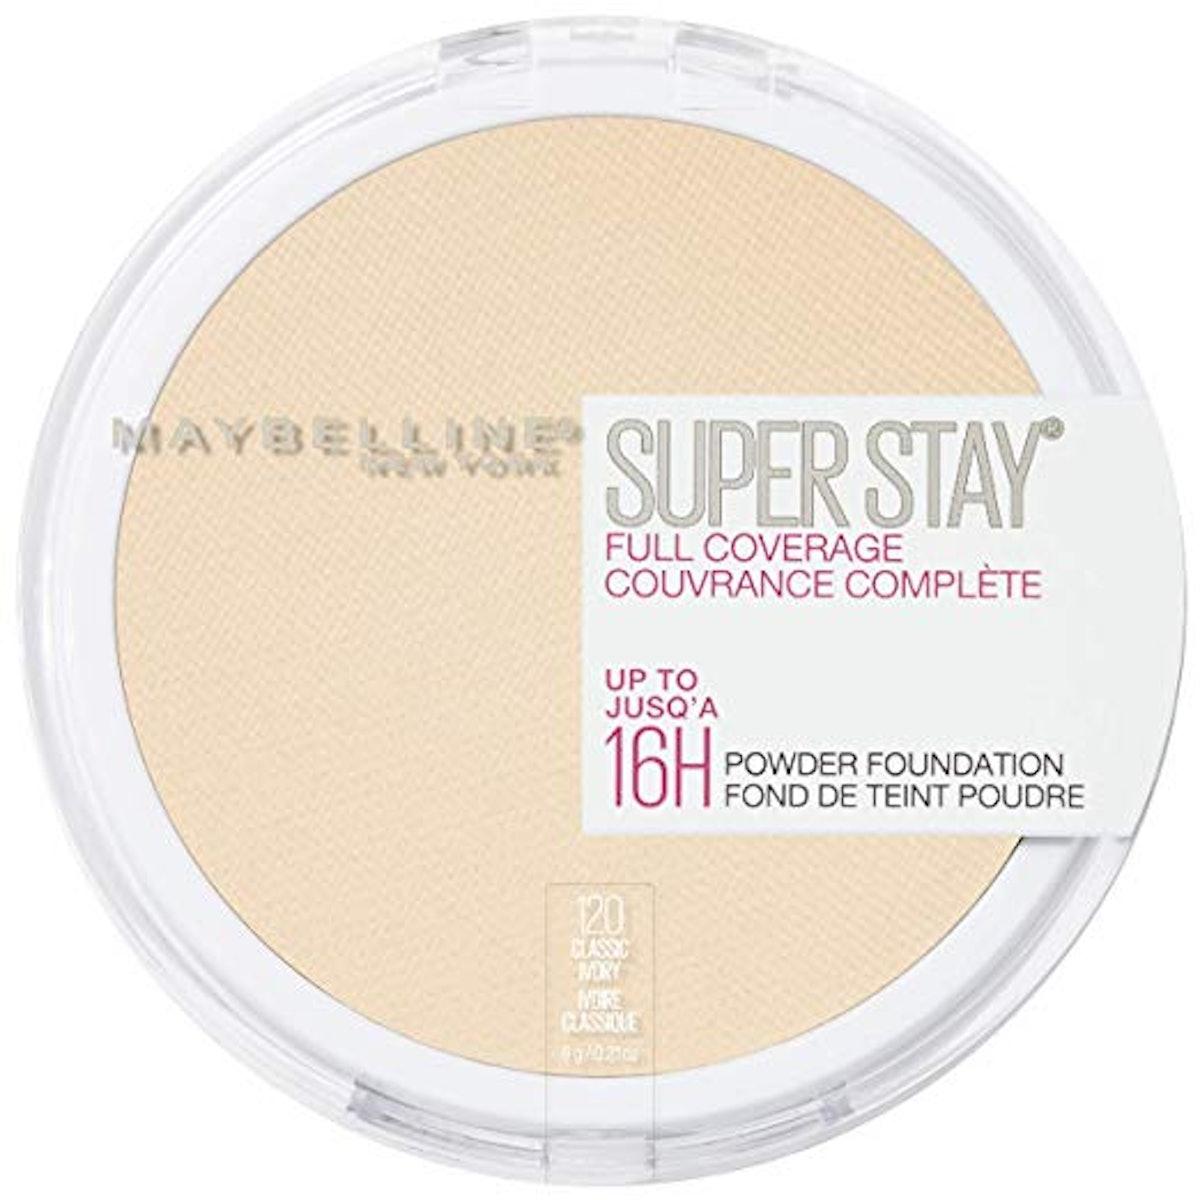 Maybelline New York Super Stay Full Coverage Powder Foundation